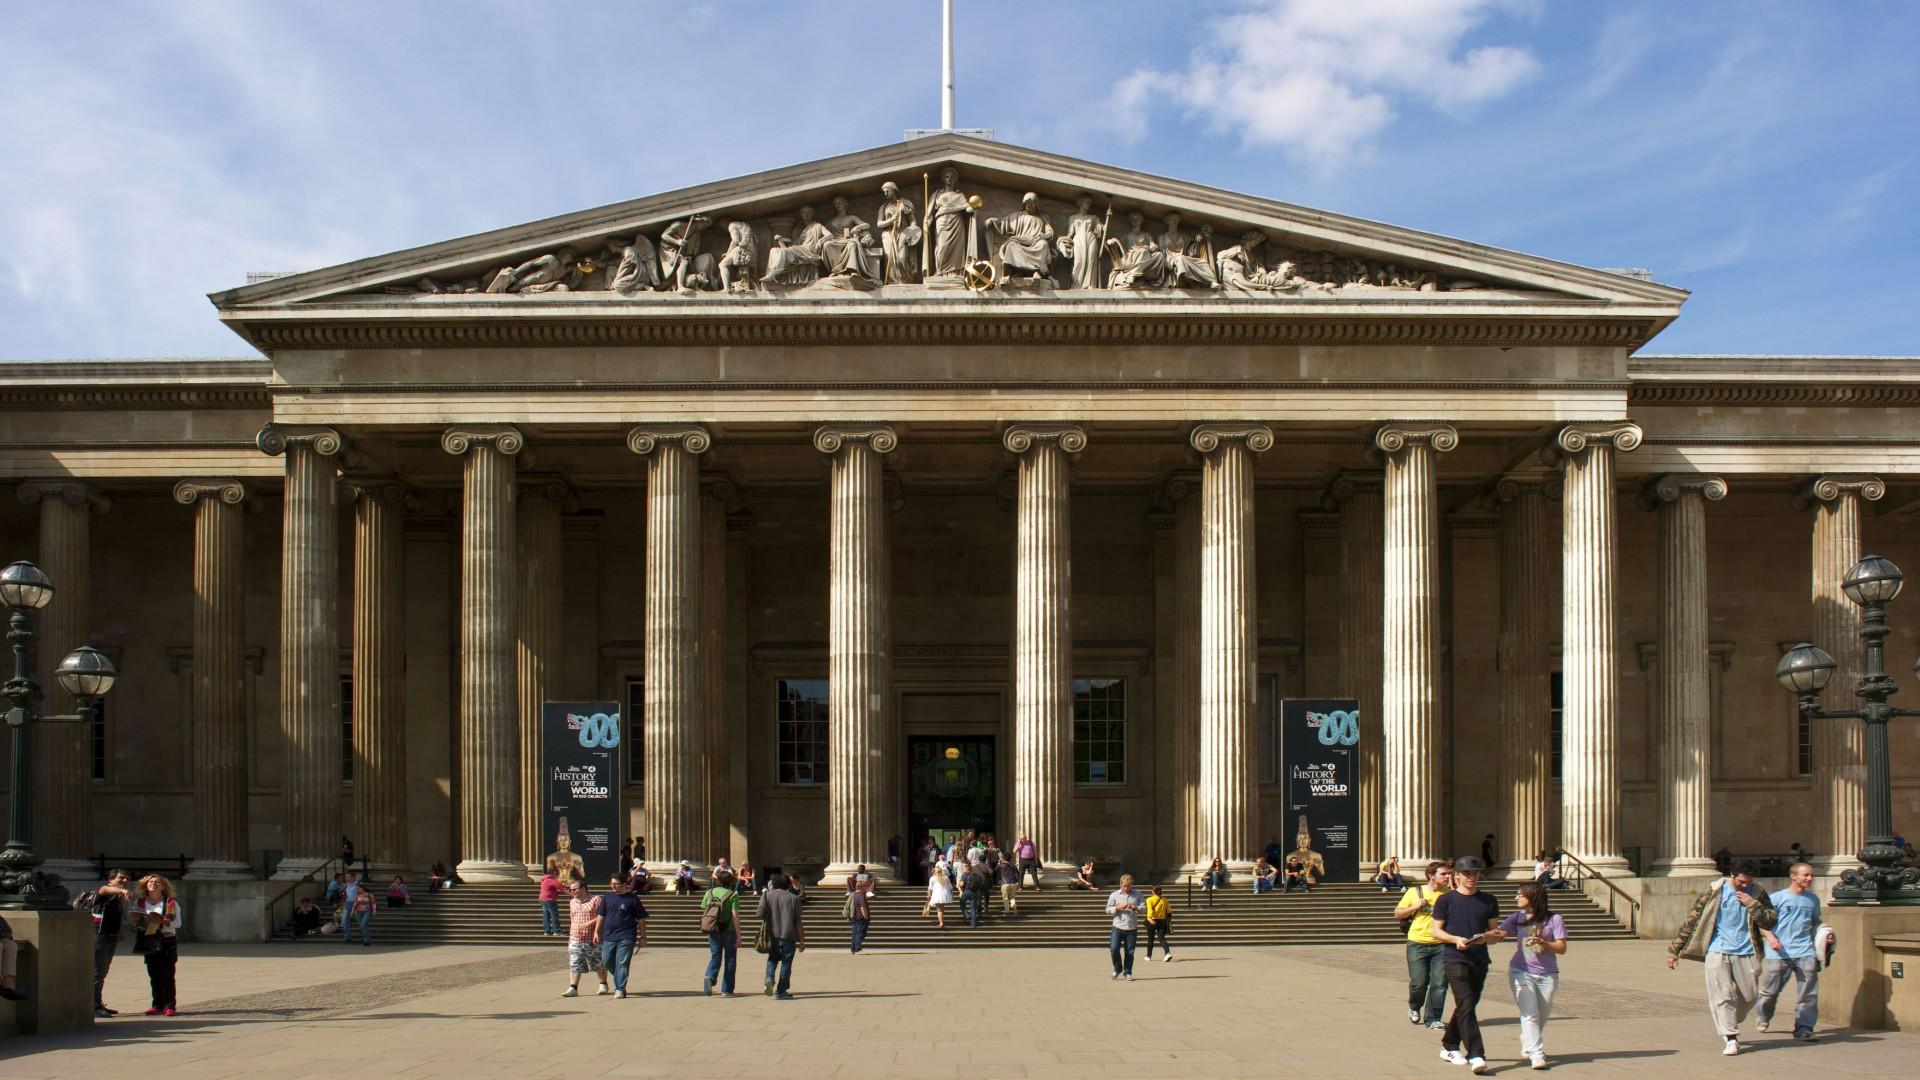 The British Museum, England